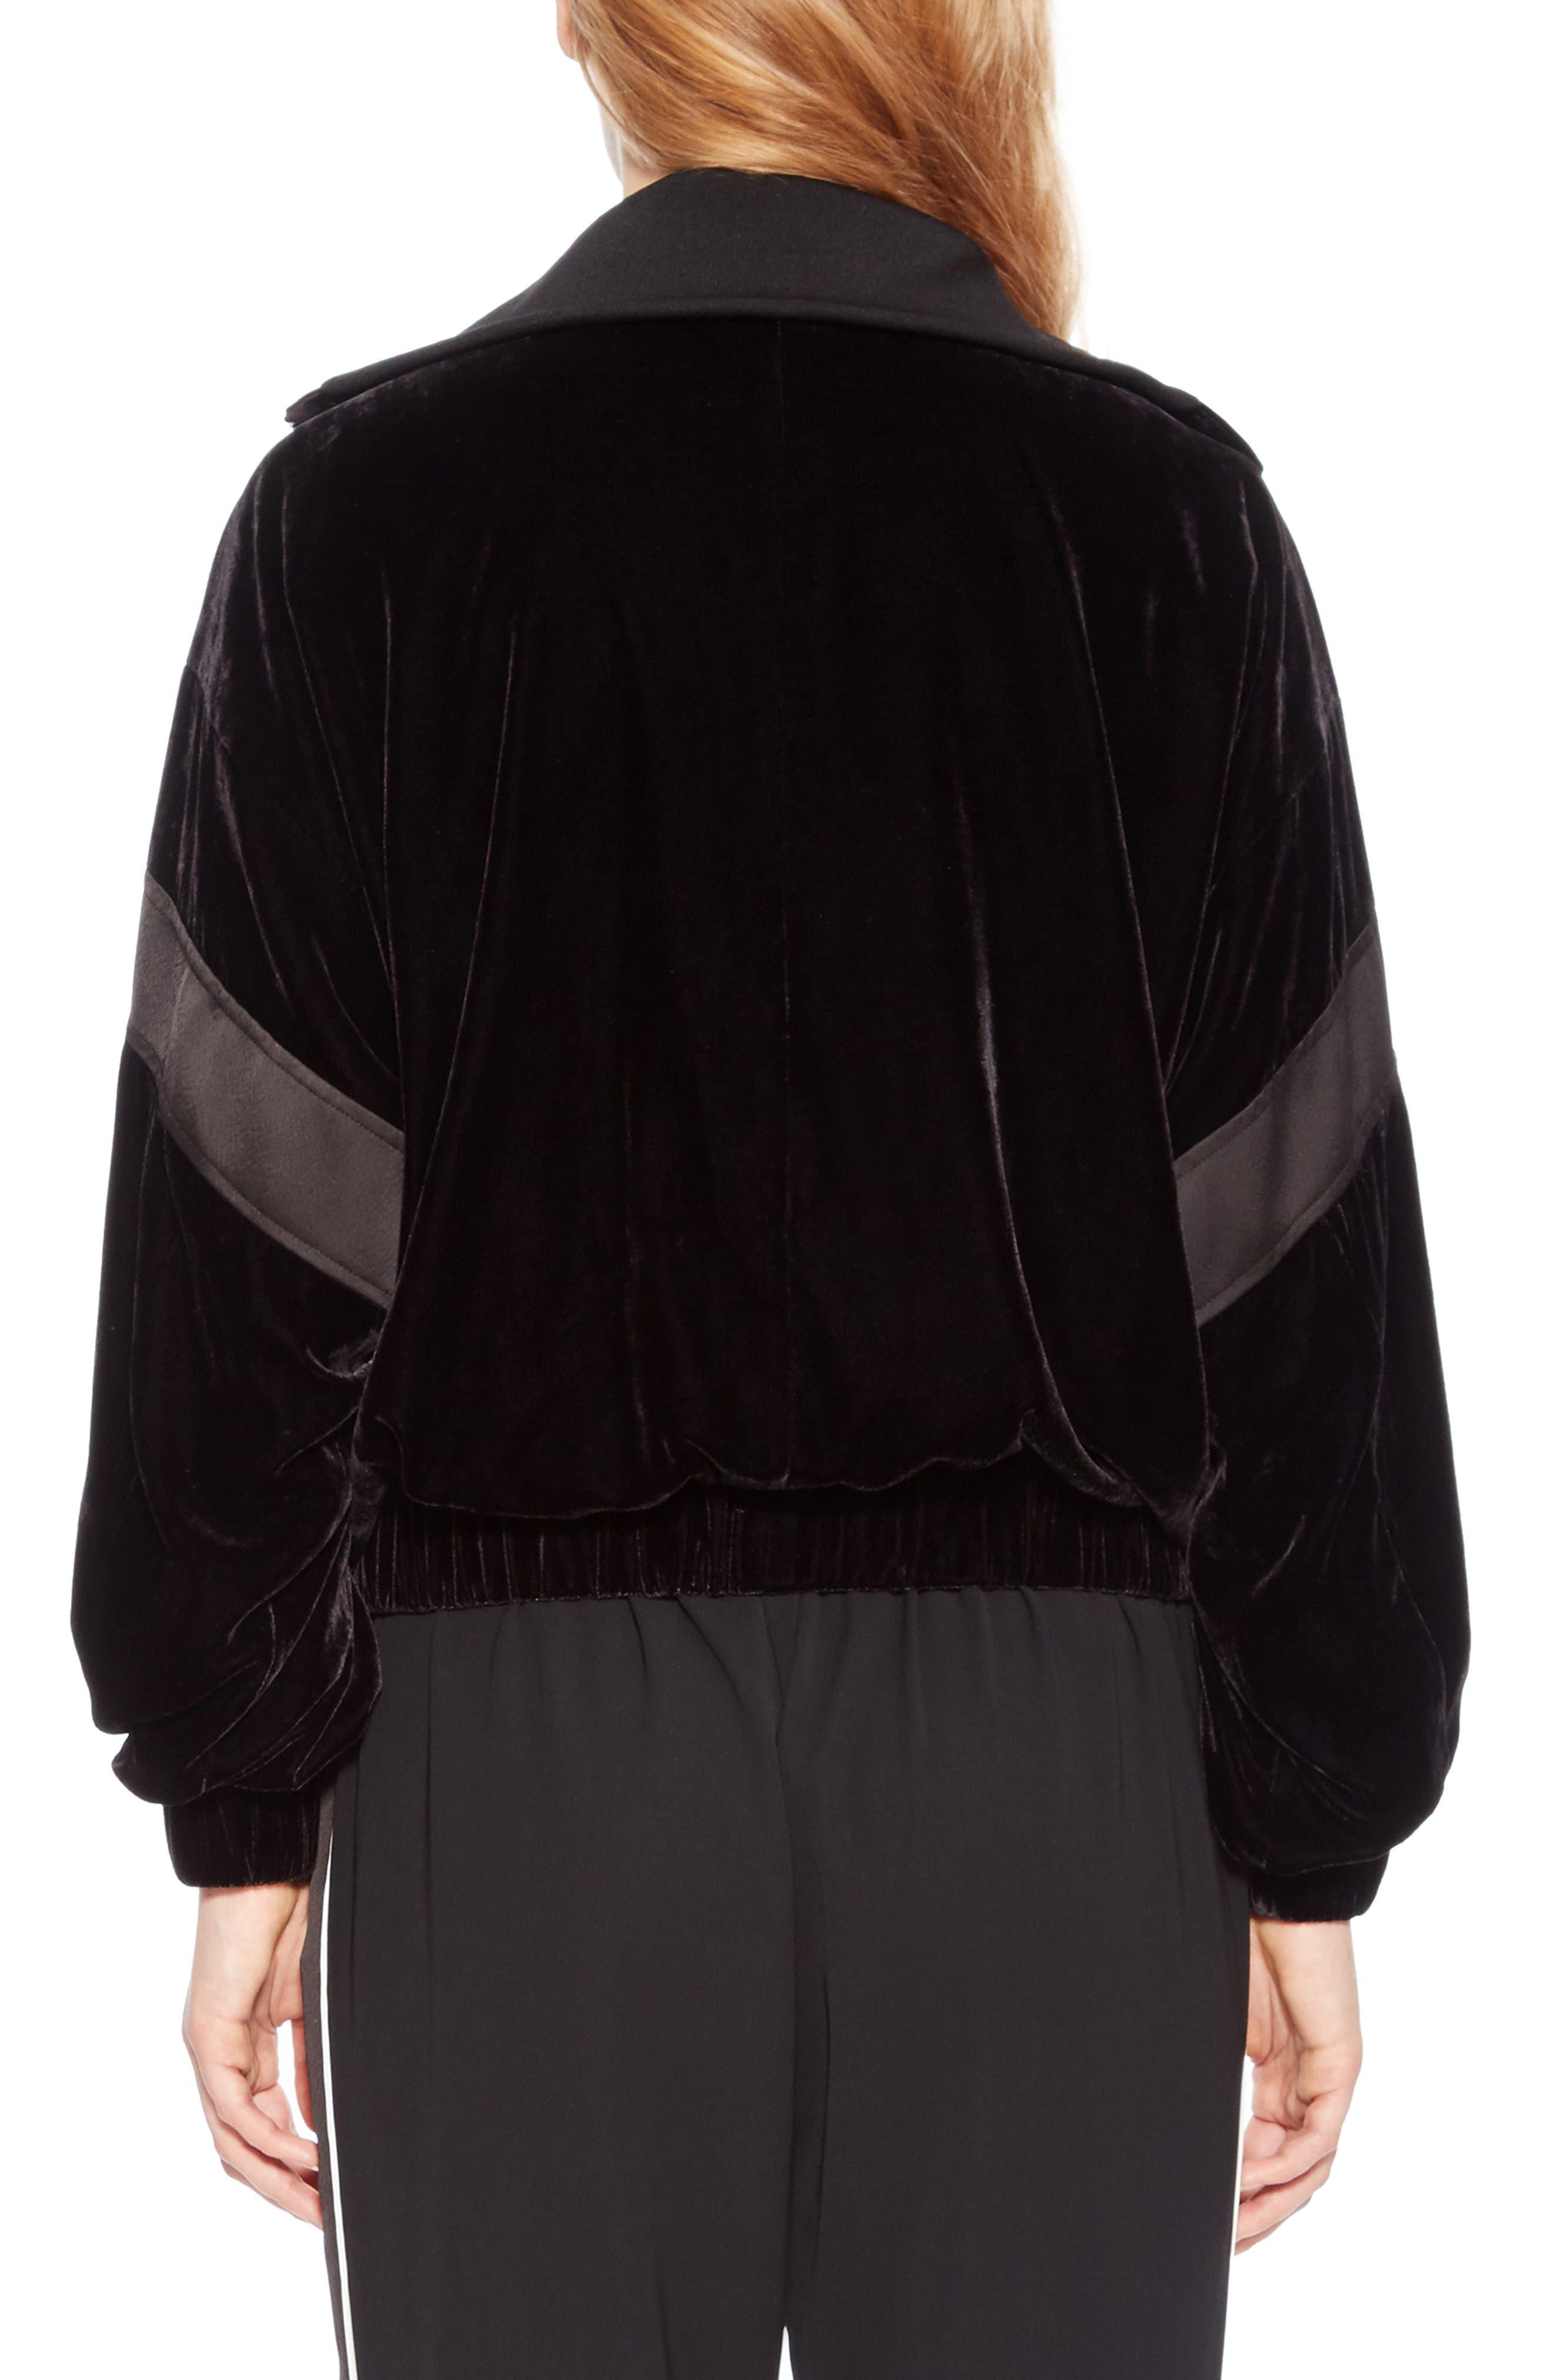 Hollis Jacket,                             Alternate thumbnail 2, color,                             BLACK